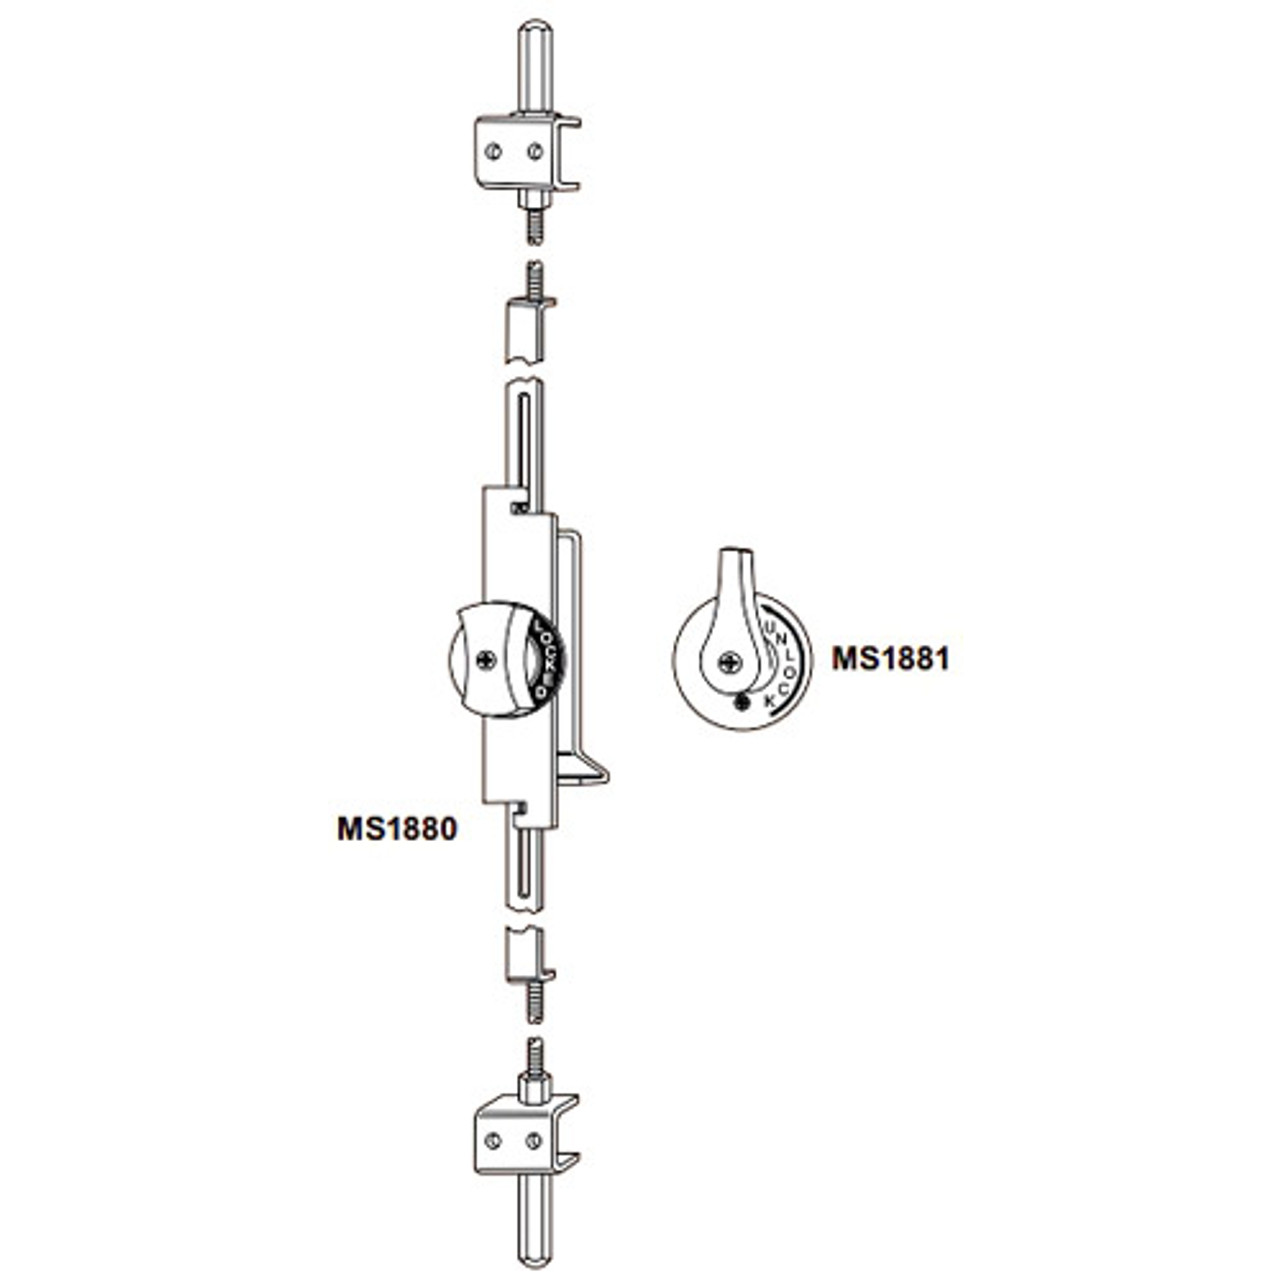 MS1880-03-682 Adams Rite Flushbolt in Satin Chrome Finish